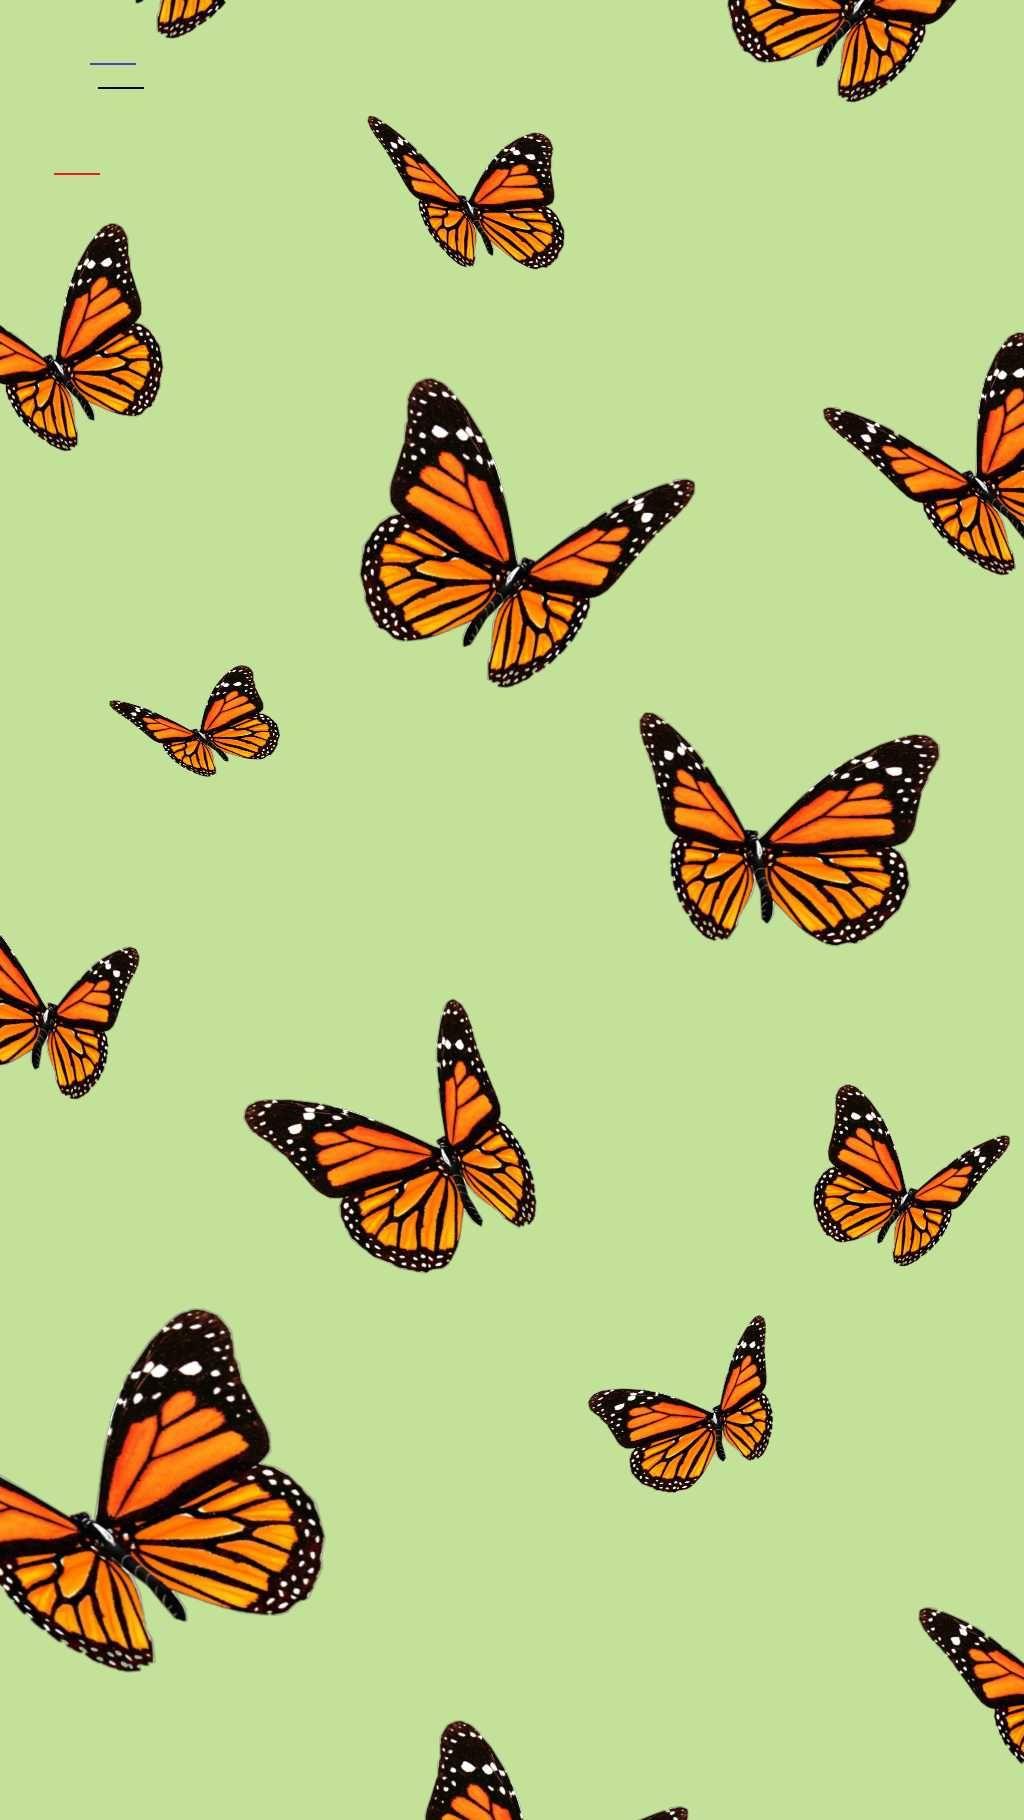 #falliphonewallpaper in 2020 | Butterfly wallpaper iphone ...